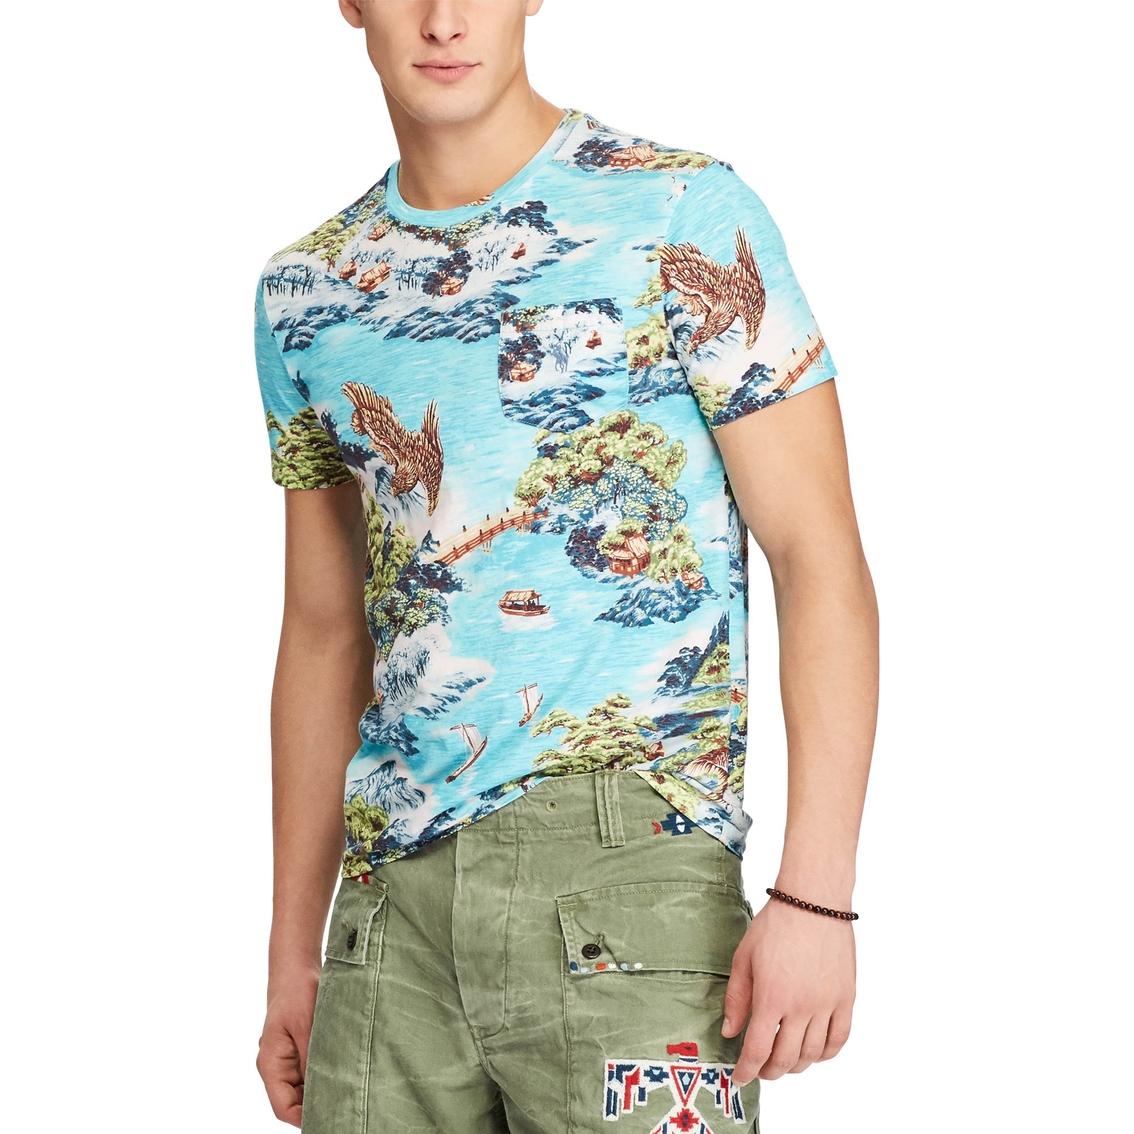 e7d0f7676 Polo Ralph Lauren Classic Fit Print Cotton T Shirt | Polo Ralph ...